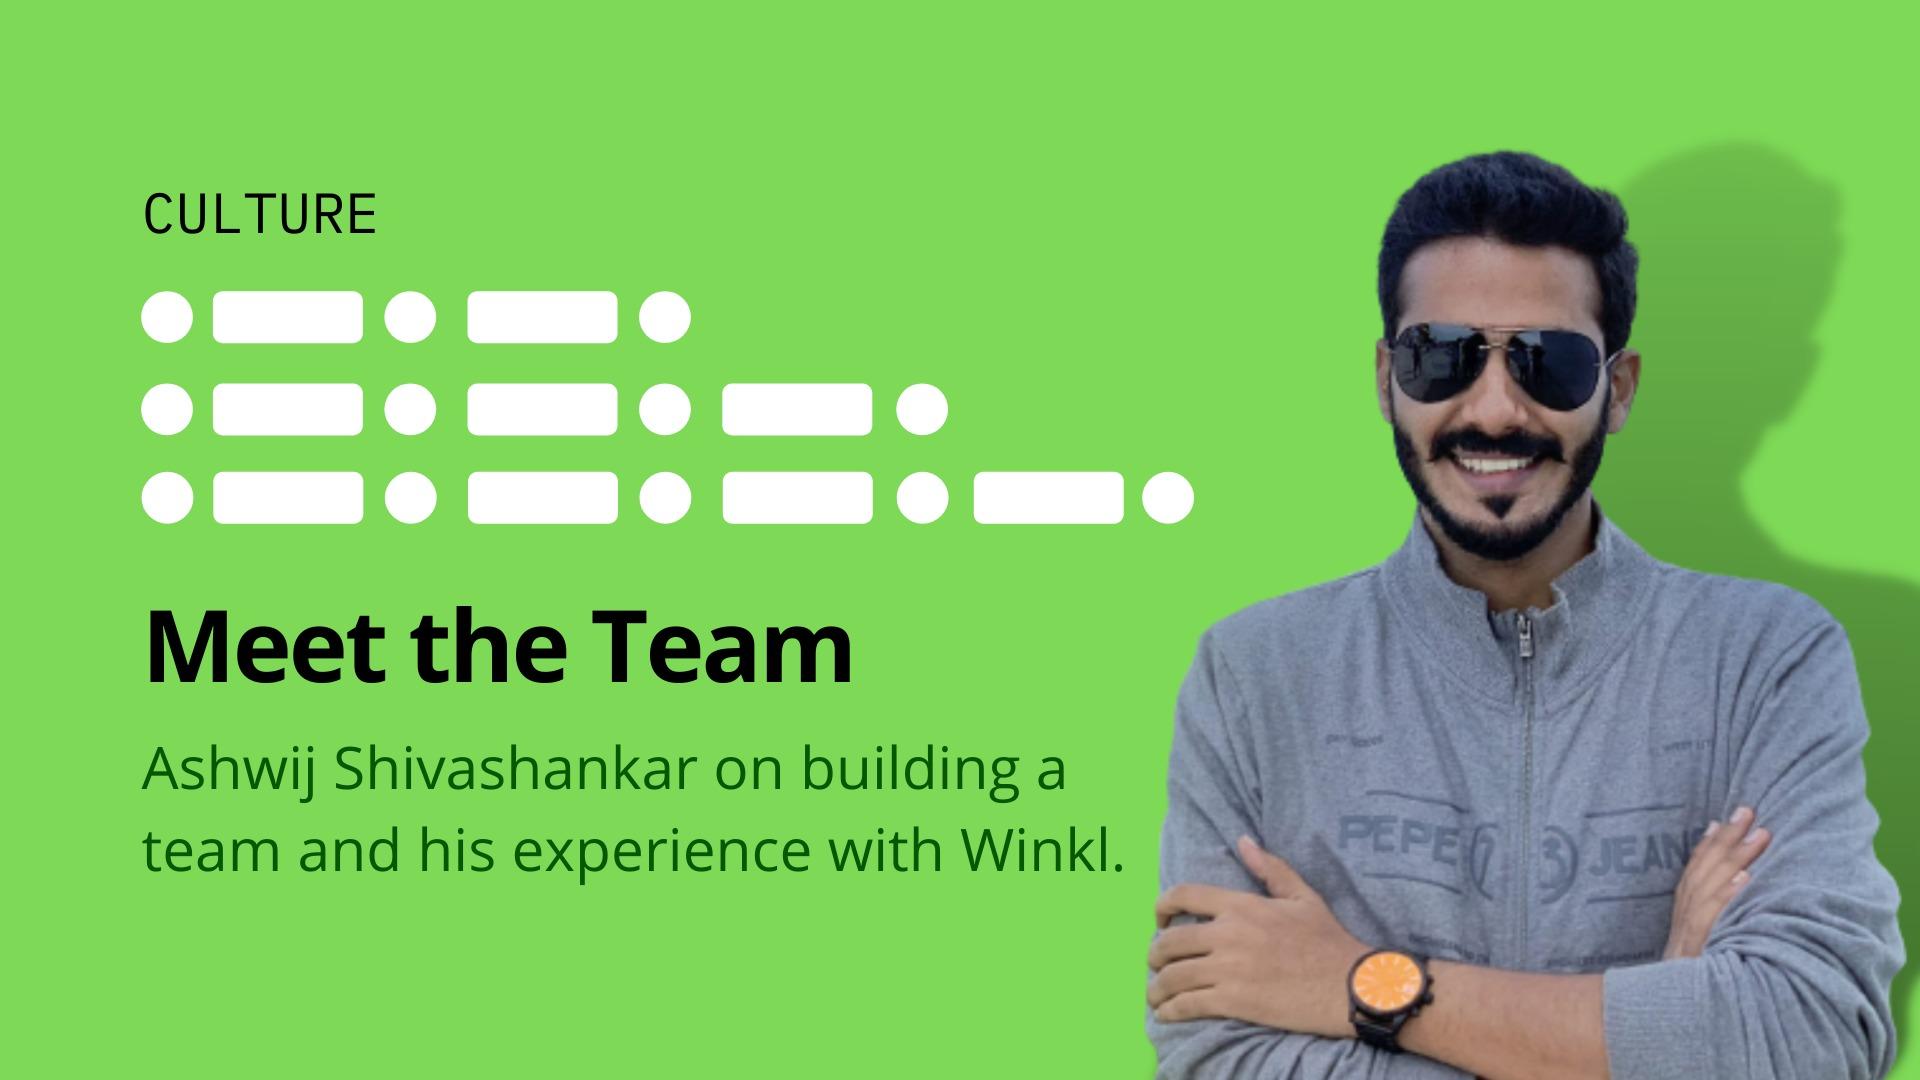 Meet the Team: Ashwij Shivashankar on his experience building the sales team at Winkl - blog by Winkl (An influencer marketing platform)